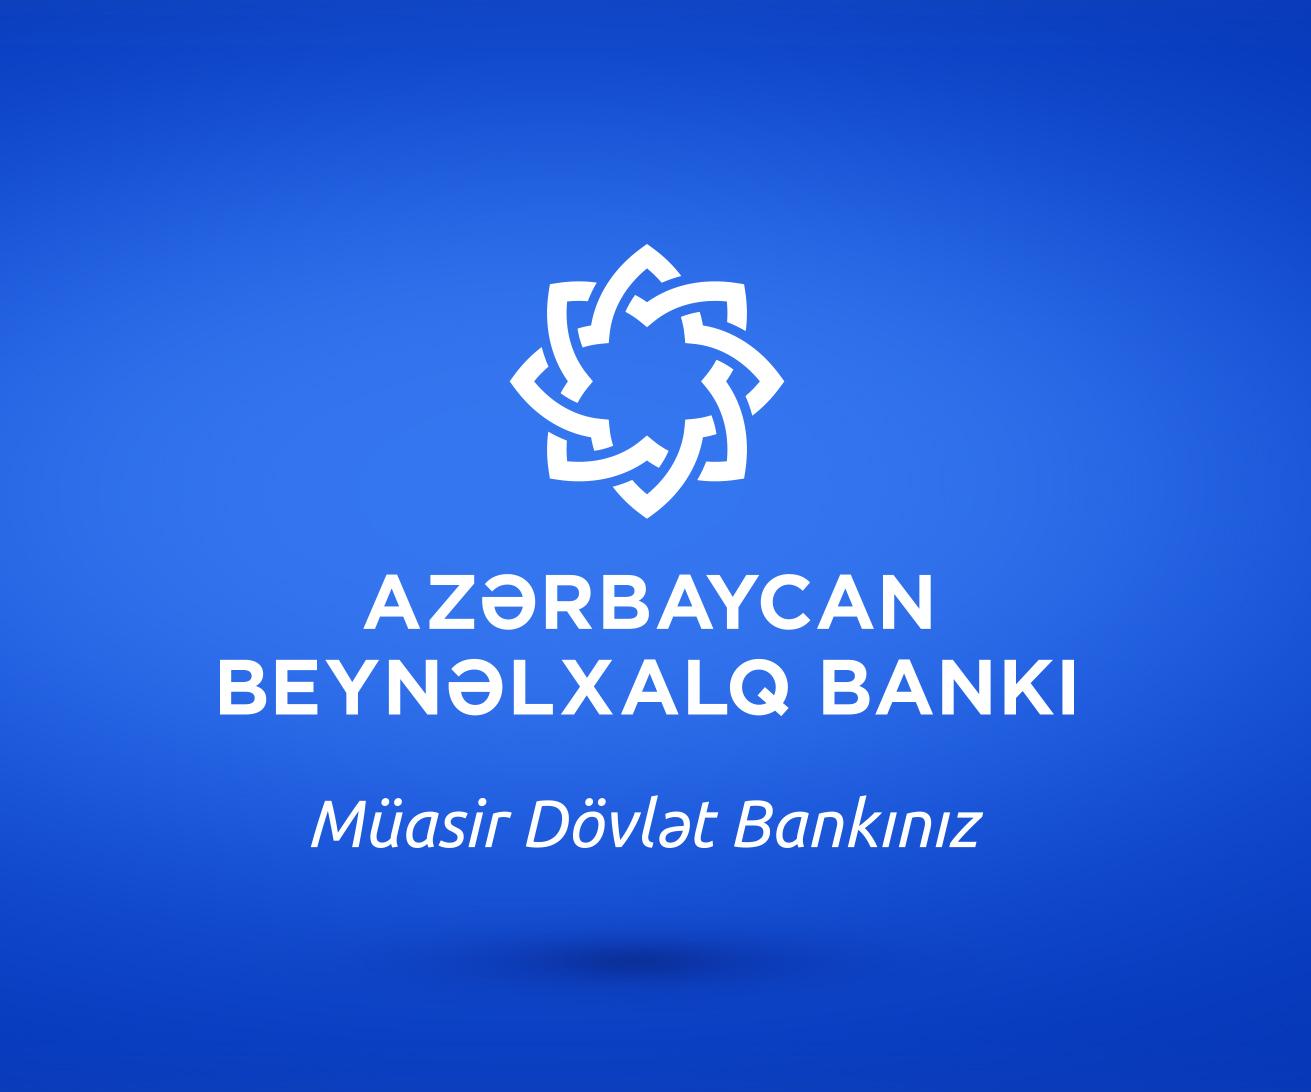 Акция по сдаче крови в Международном банке Азербайджана